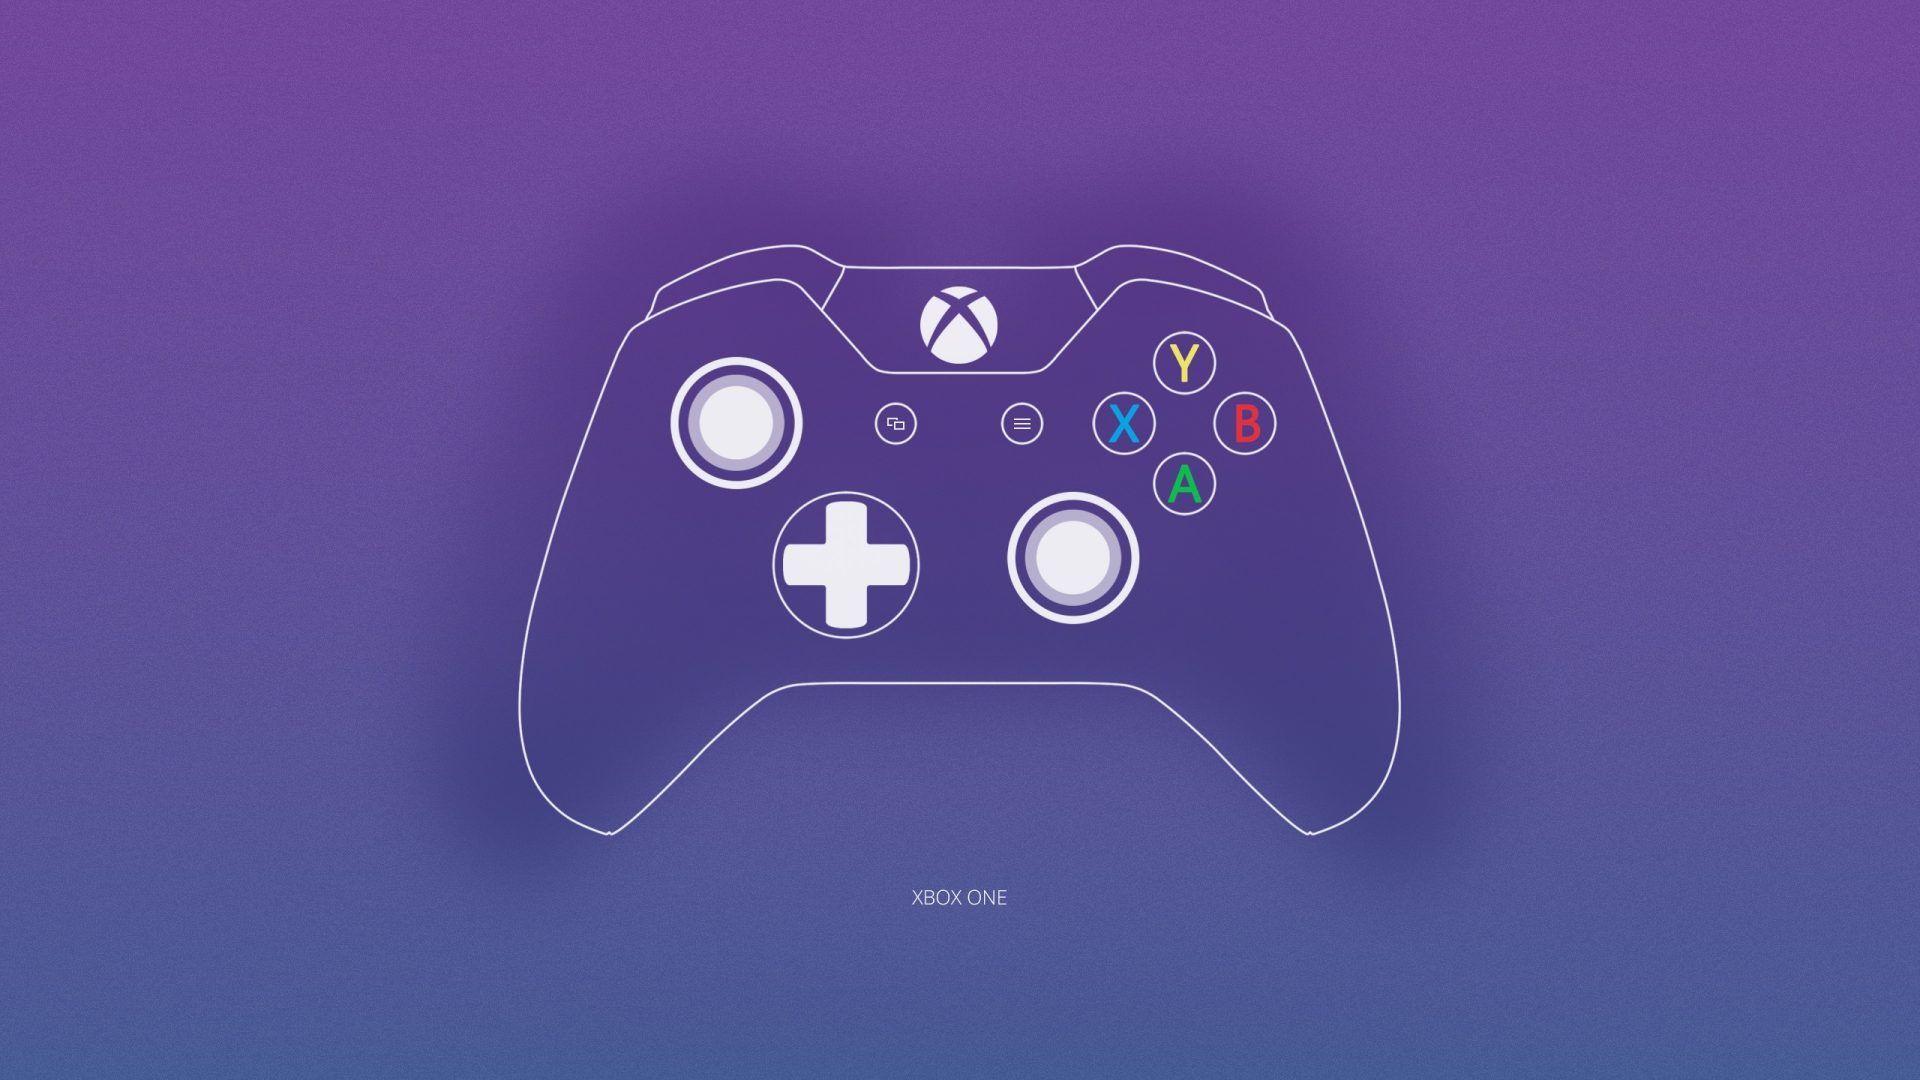 Microsoft Announces The Xbox Fanfest 2017 Xbox Controller Xbox One Controller Xbox One